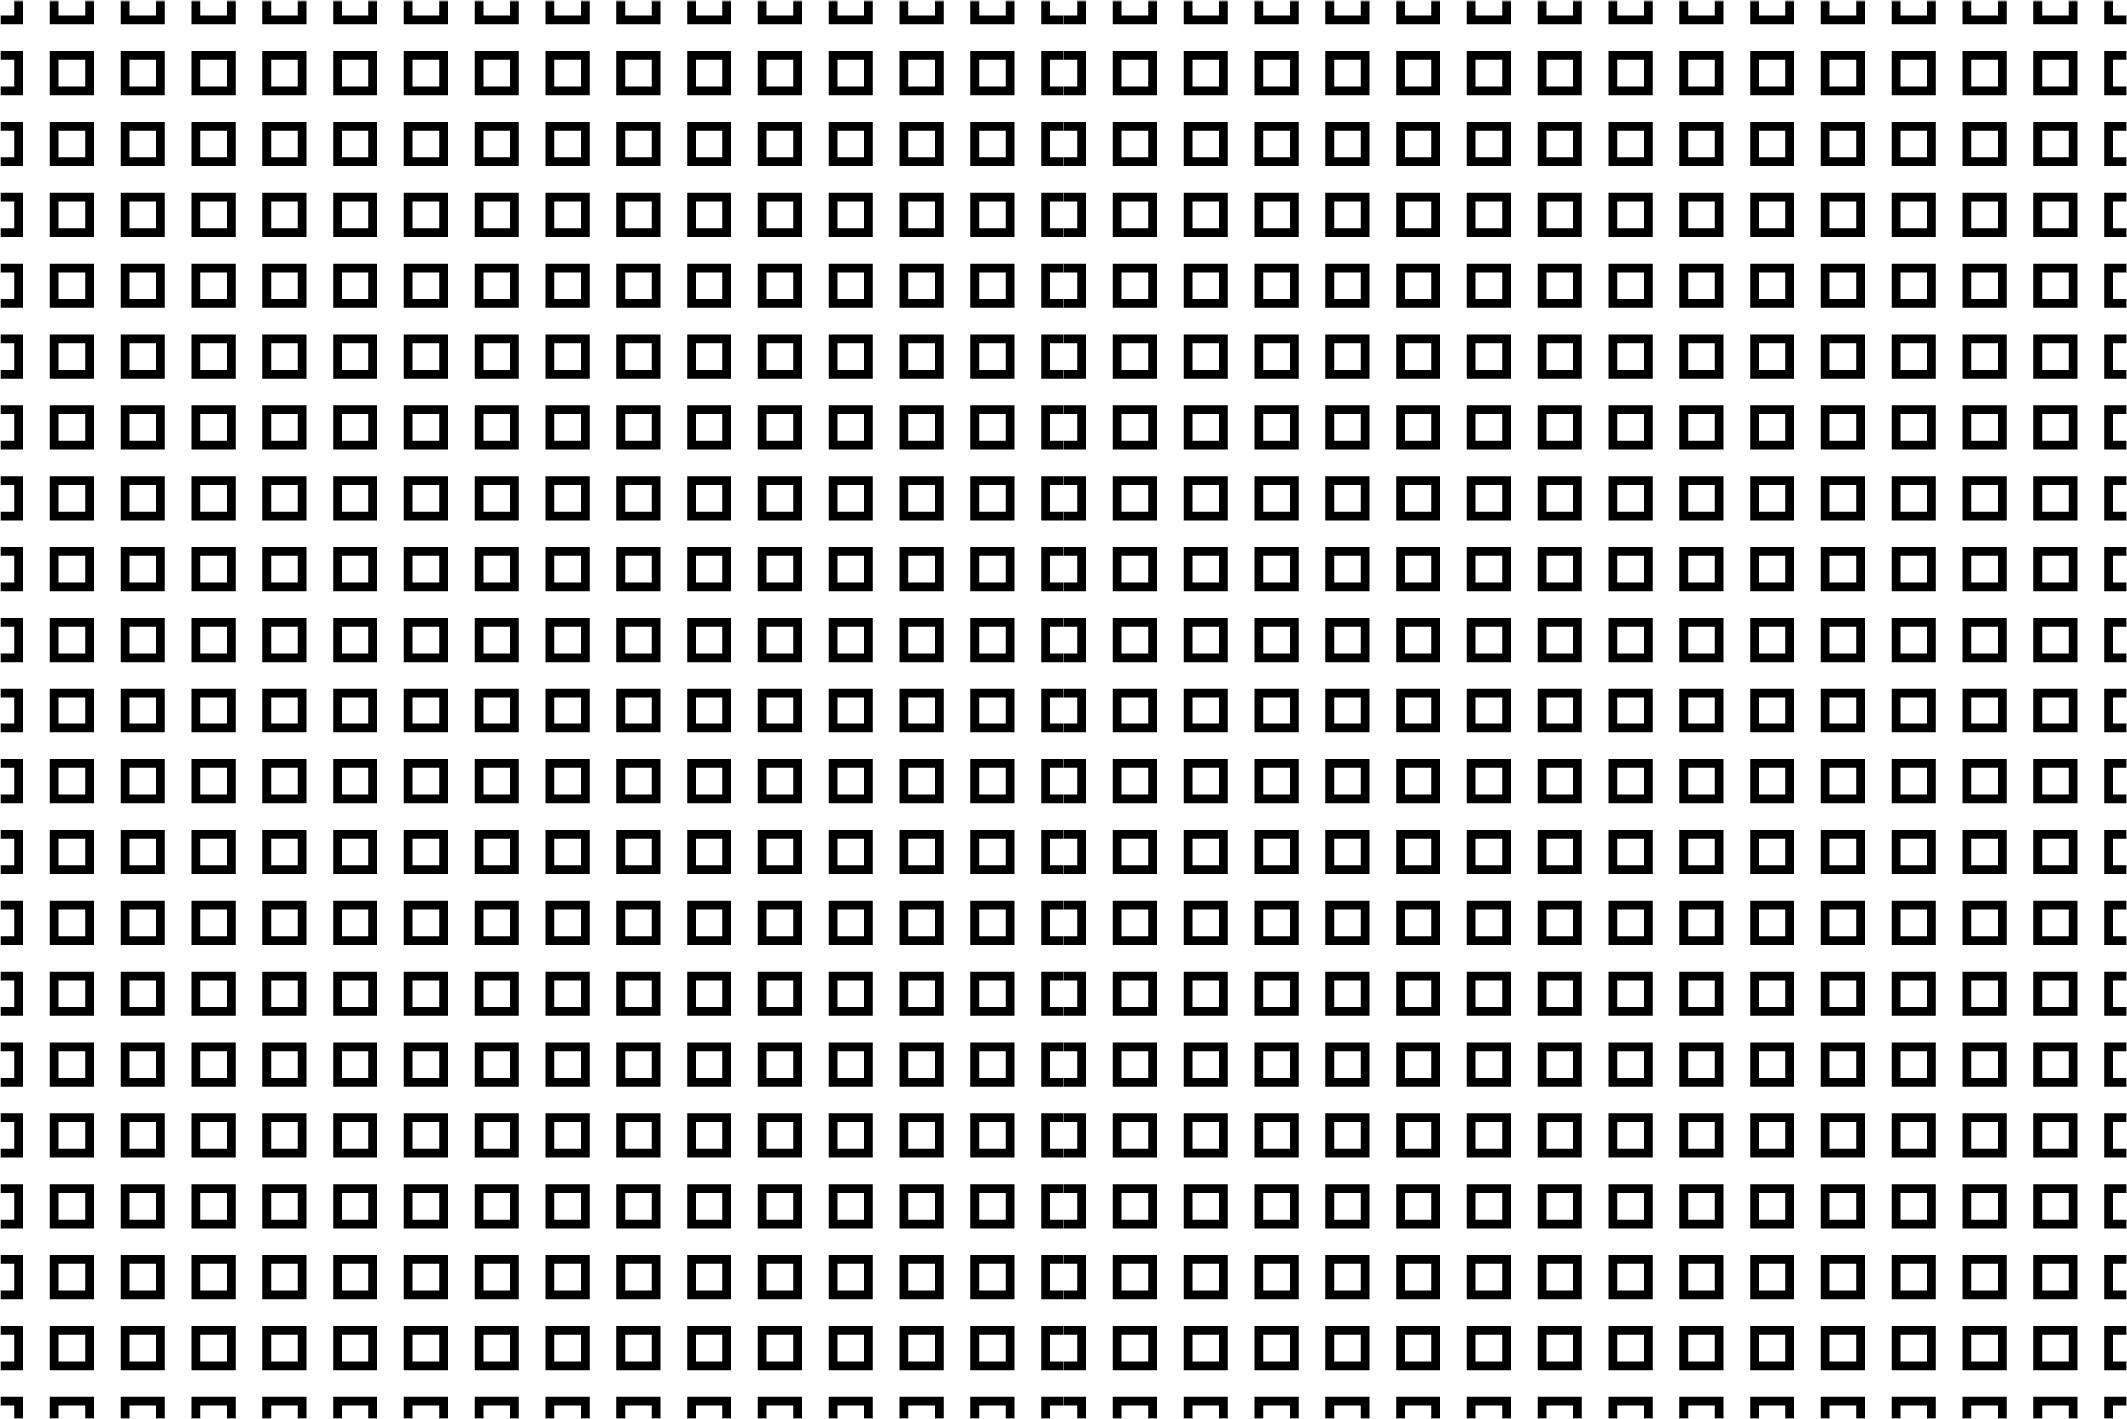 Seamless geometric patterns. B&W. example image 11